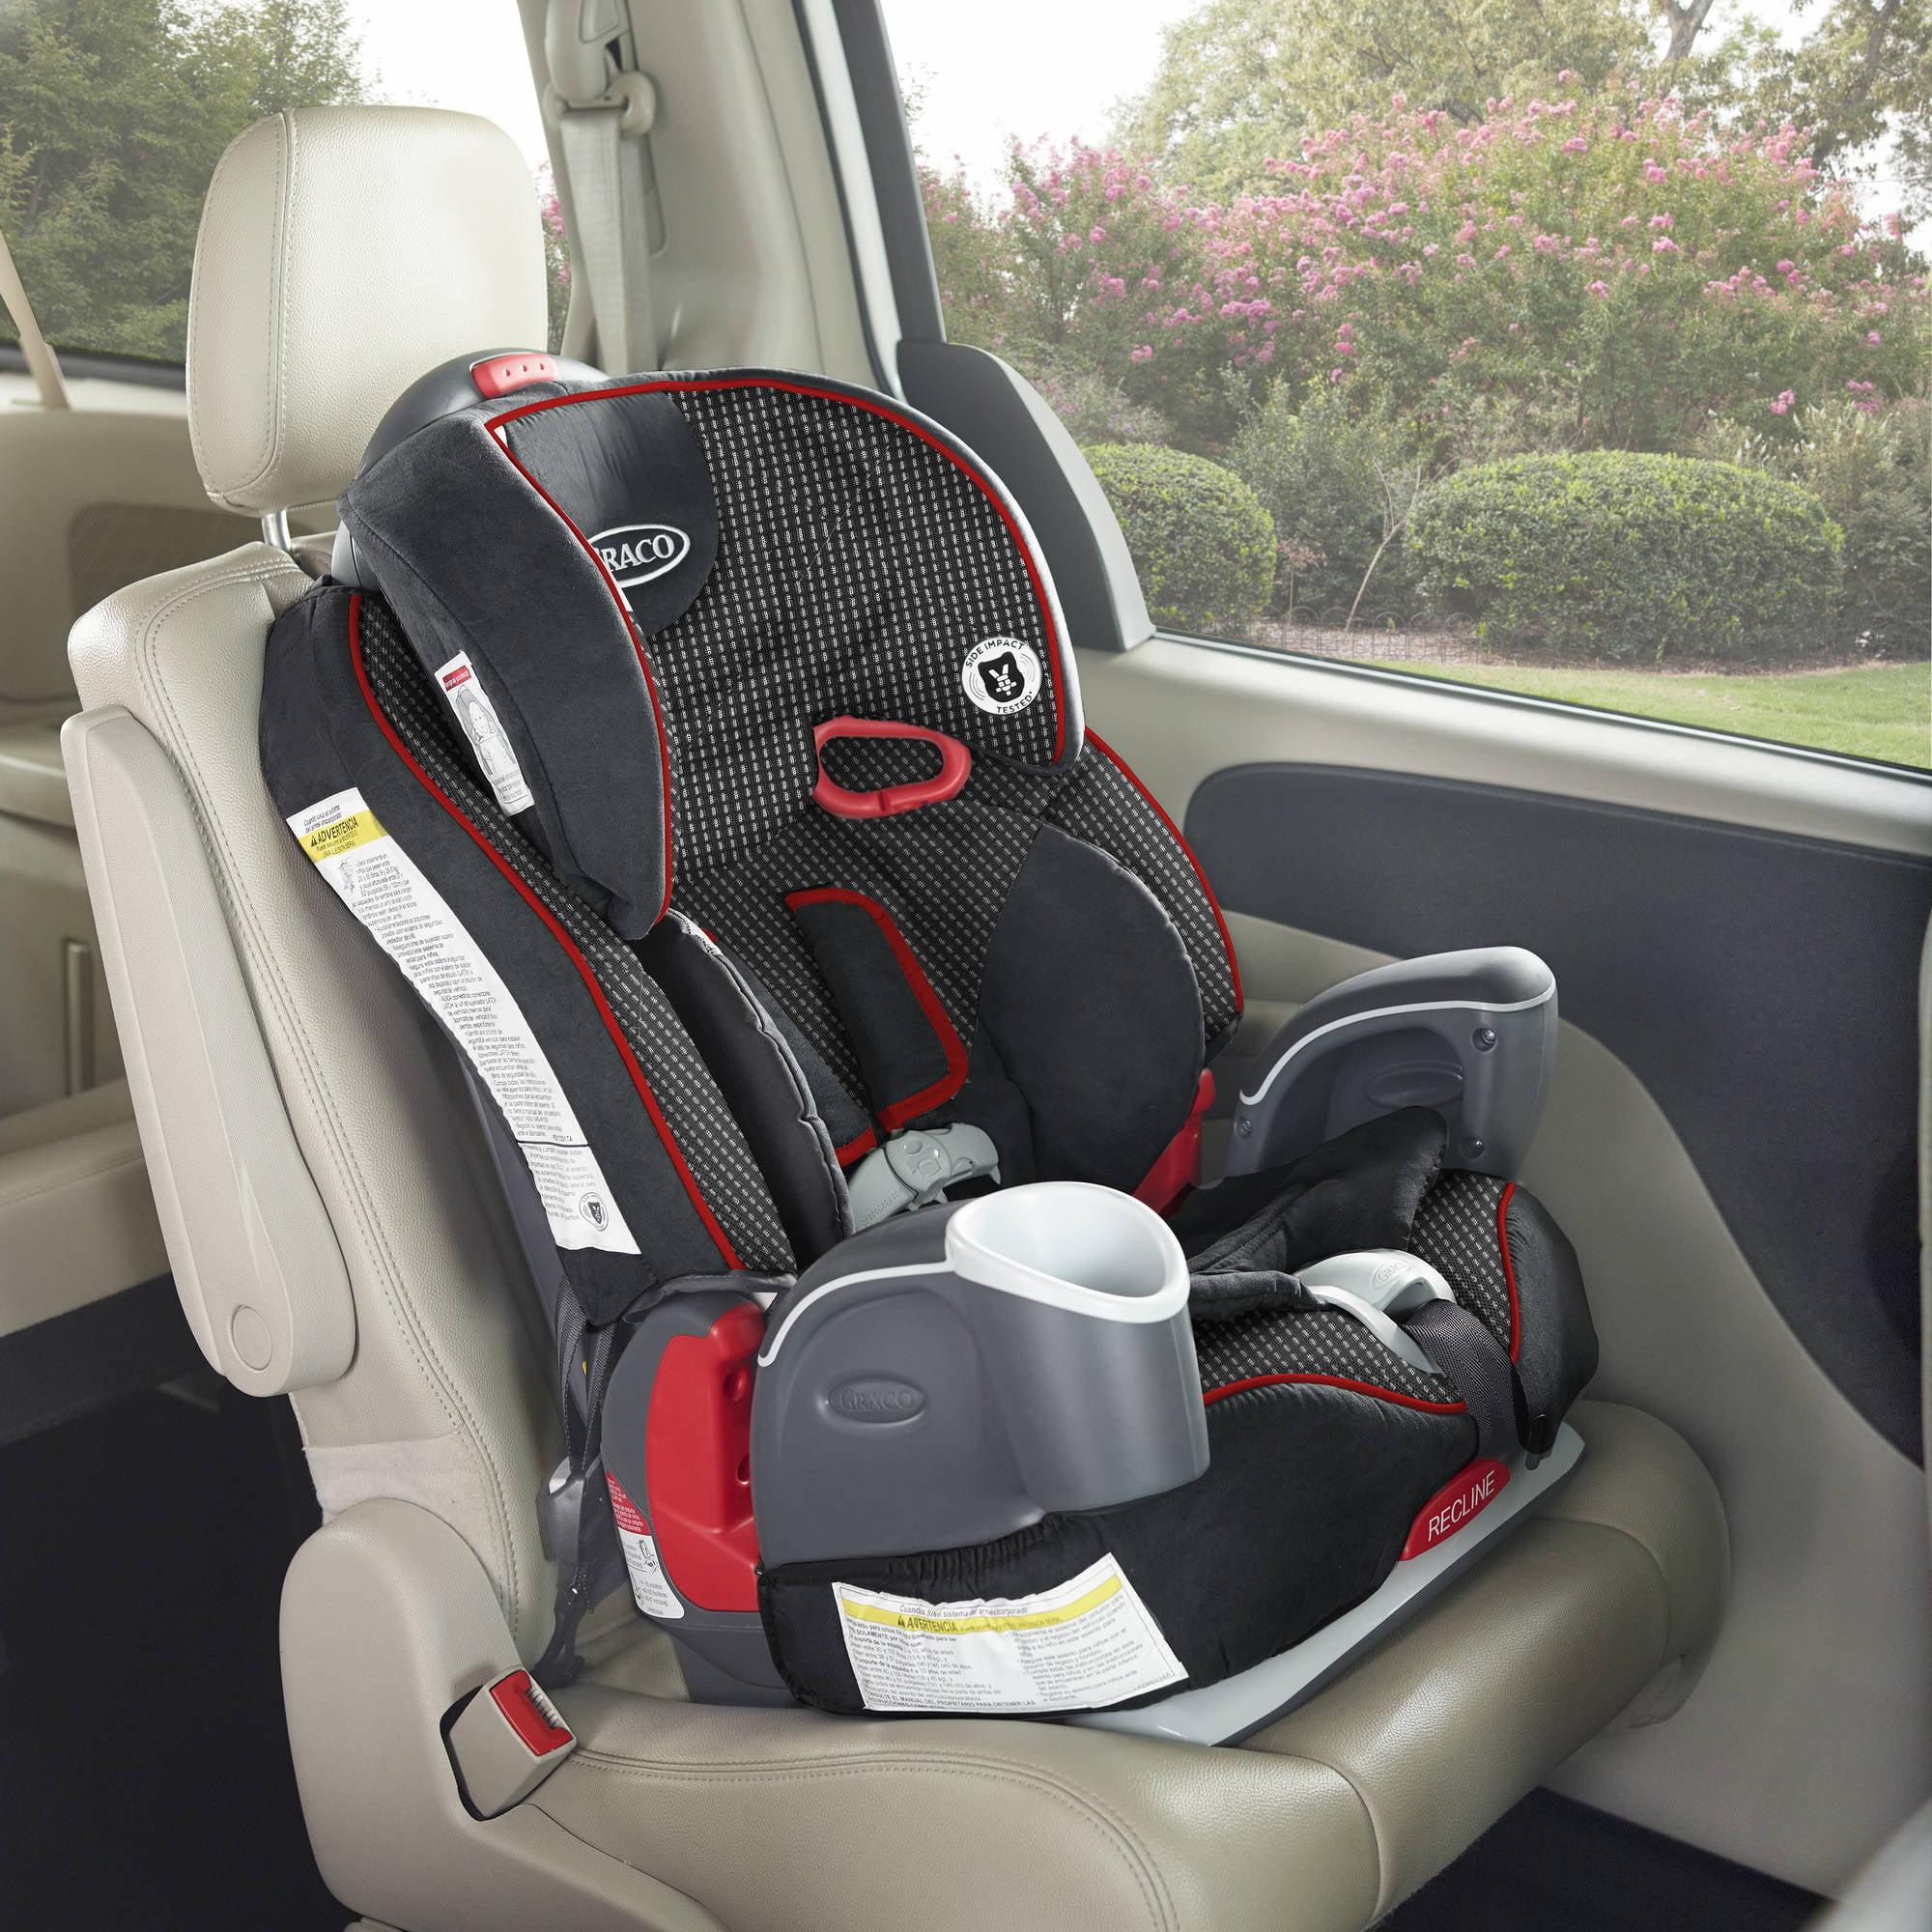 Graco nautilus 3 in 1 multi use car seat - Graco Nautilus 3 In 1 Multi Use Car Seat 28